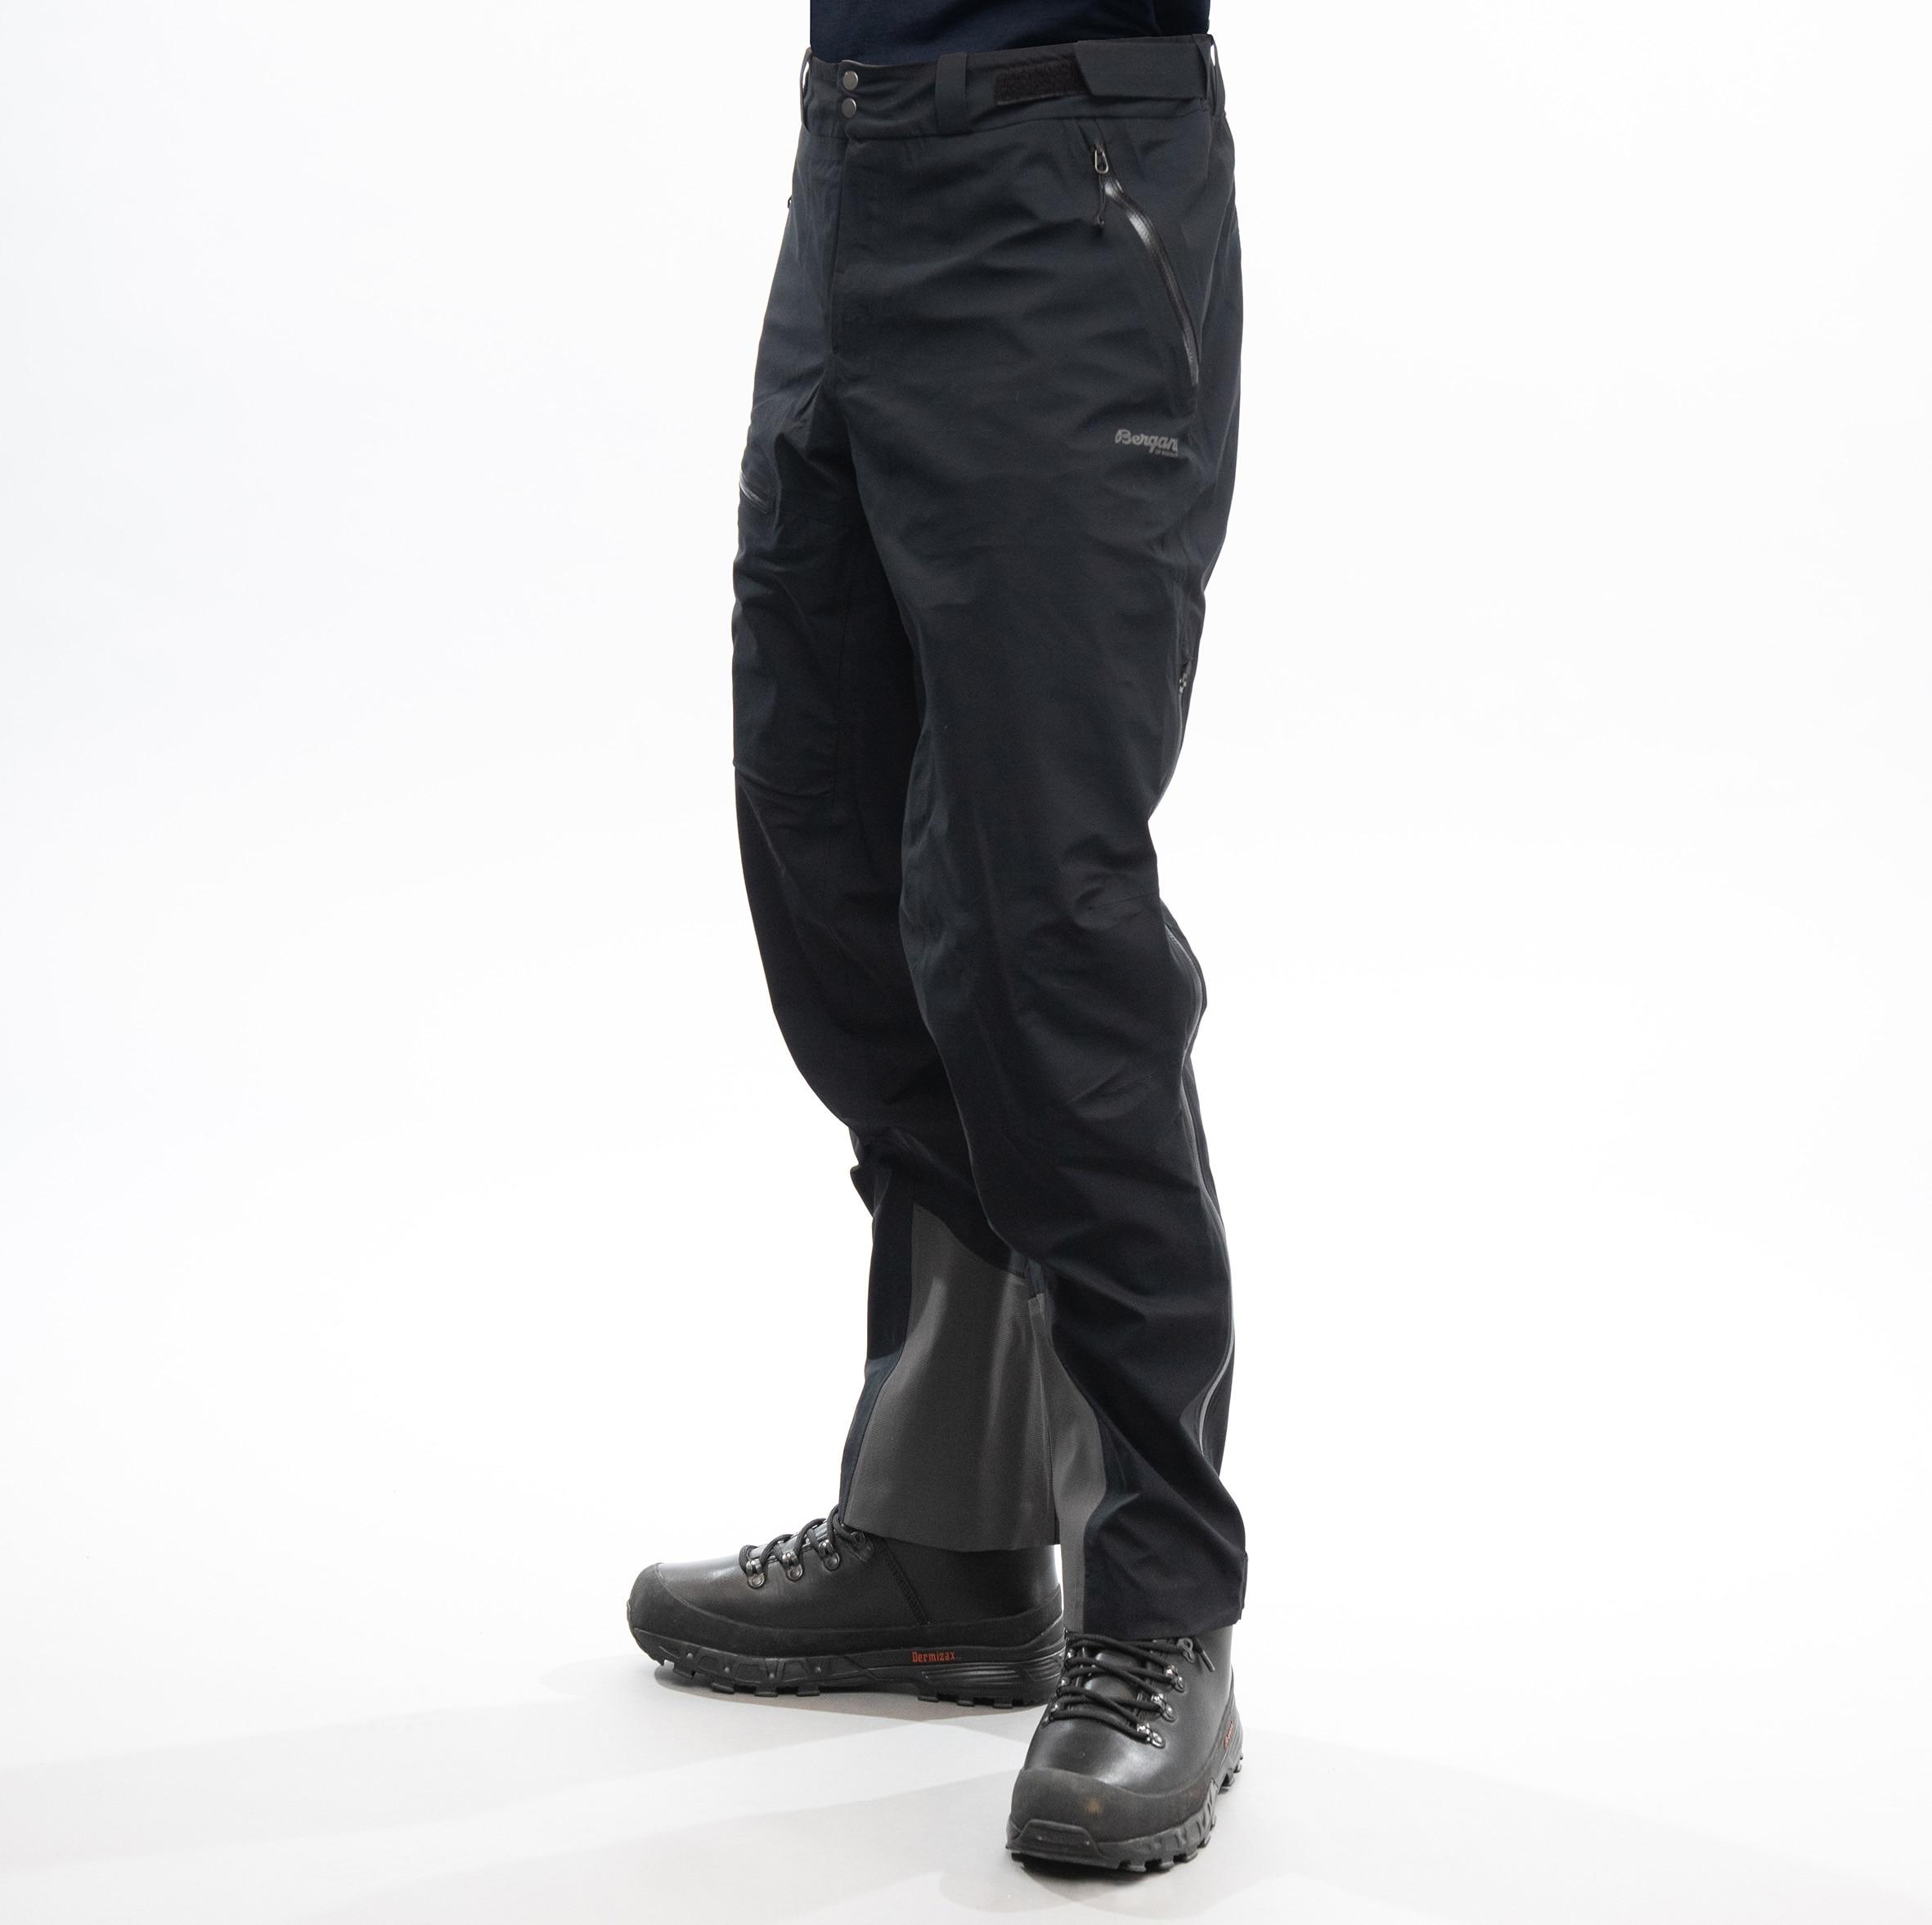 Rabot V2 3L Pants